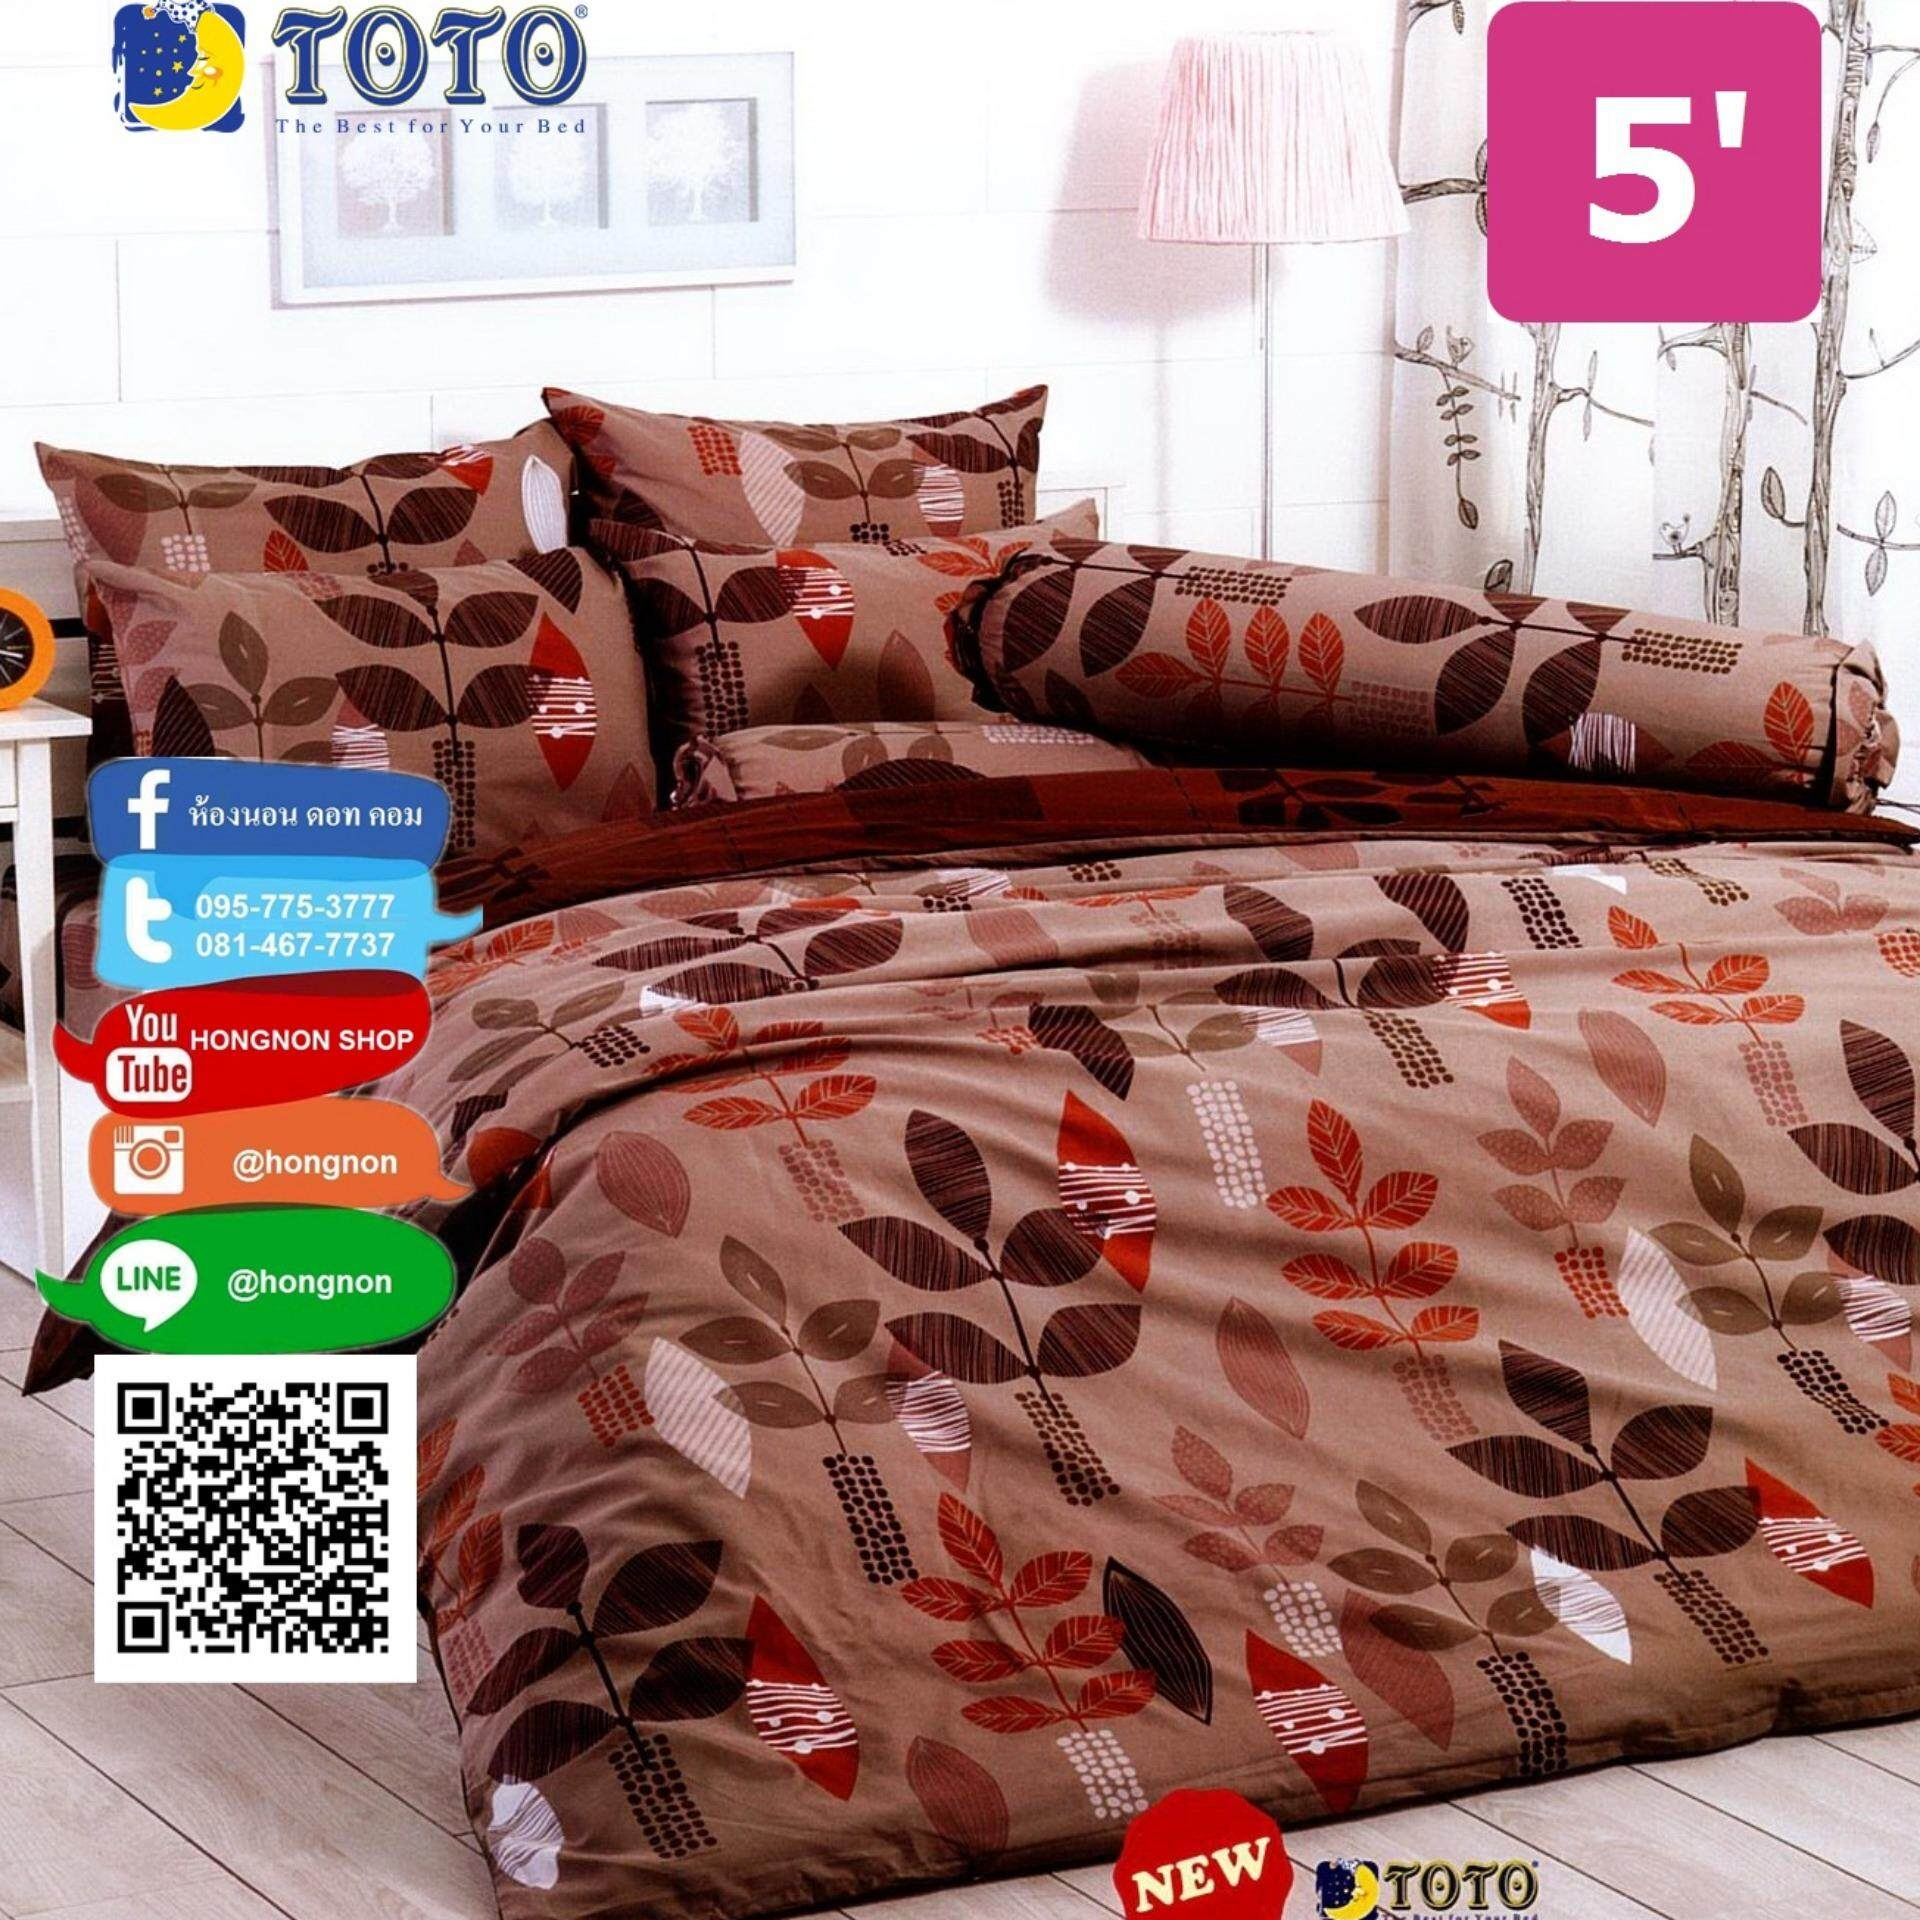 Toto ผ้าปูที่นอนโตโต้  ลายใหม่ ขายดี รหัส Tt569 ขนาด 5ฟุต.